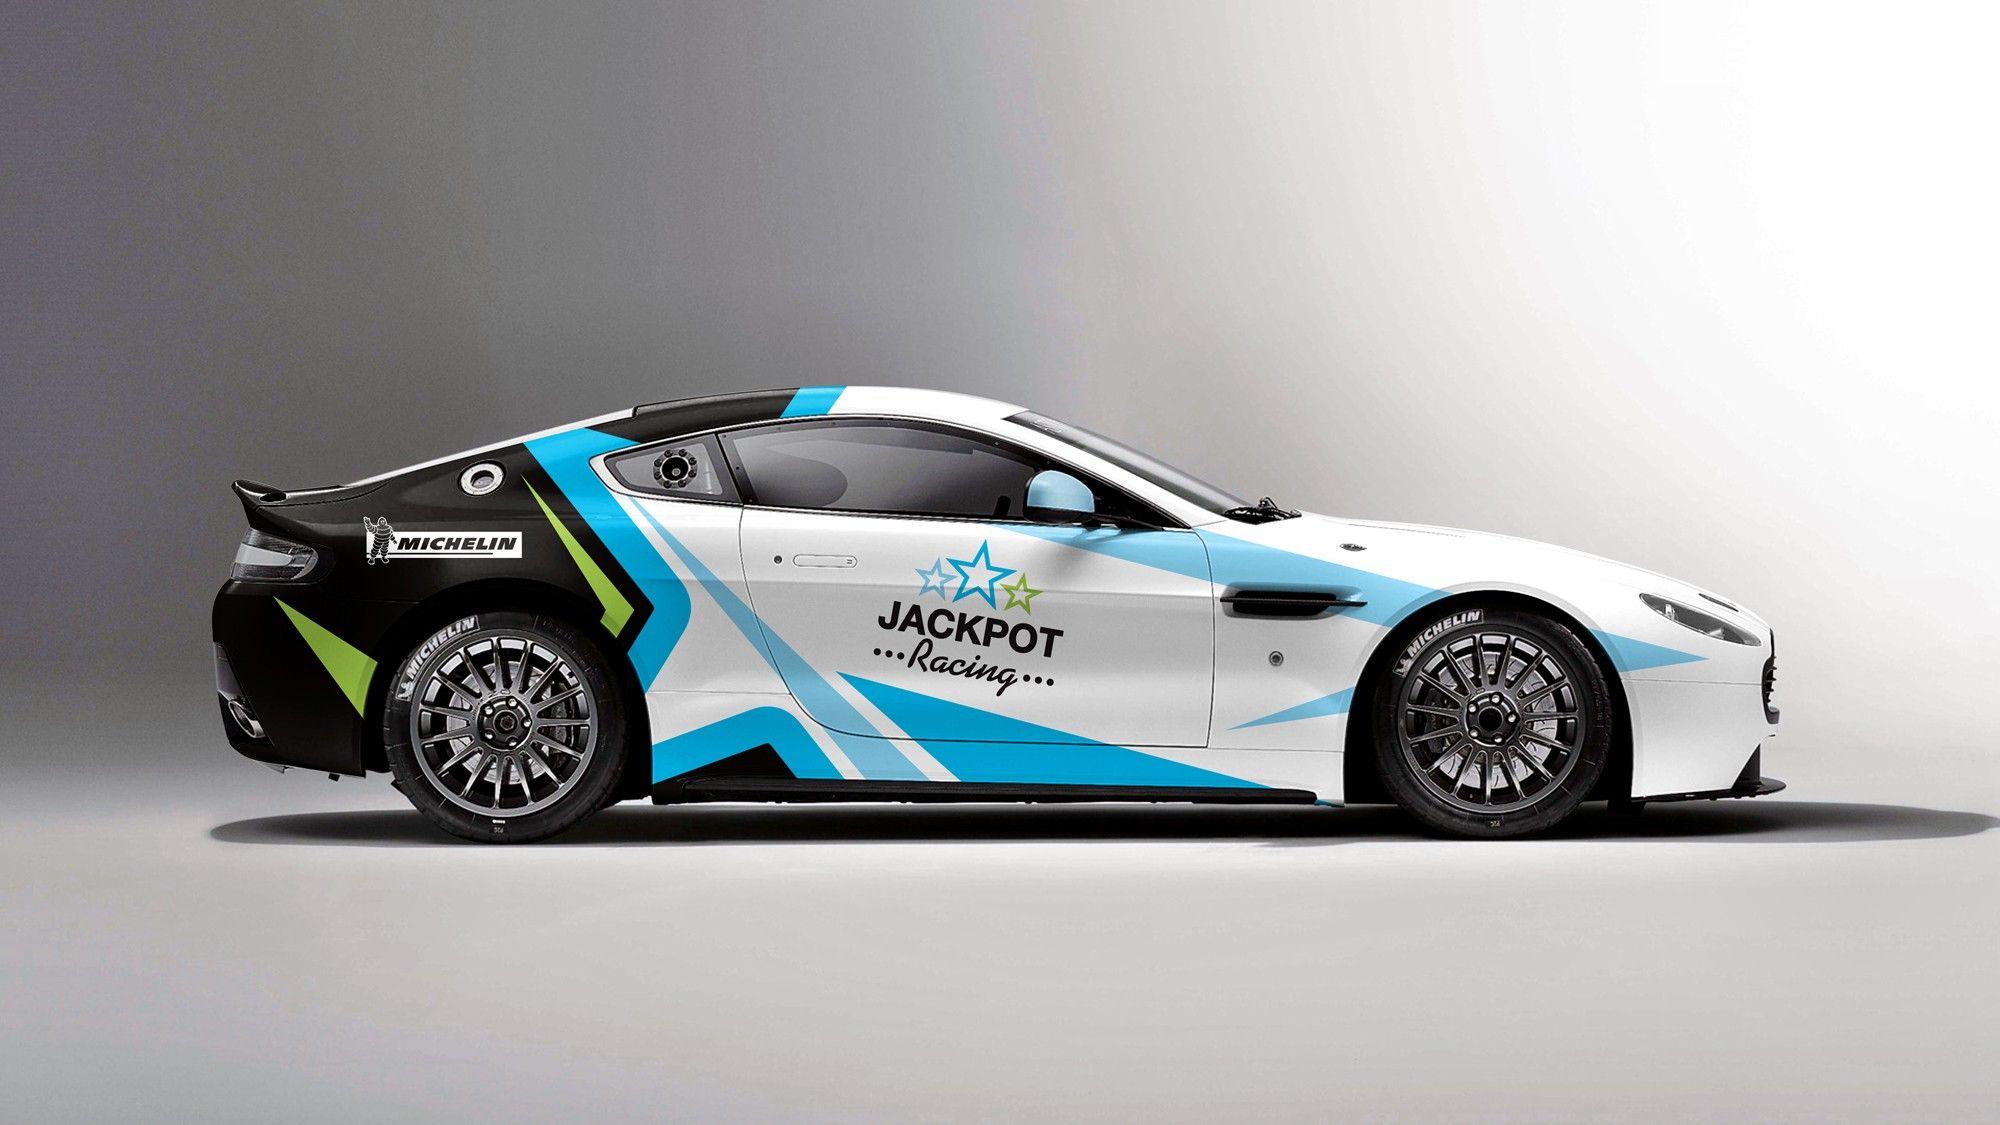 Car design sticker rally - Auto Aston Martin Jackpot Racing